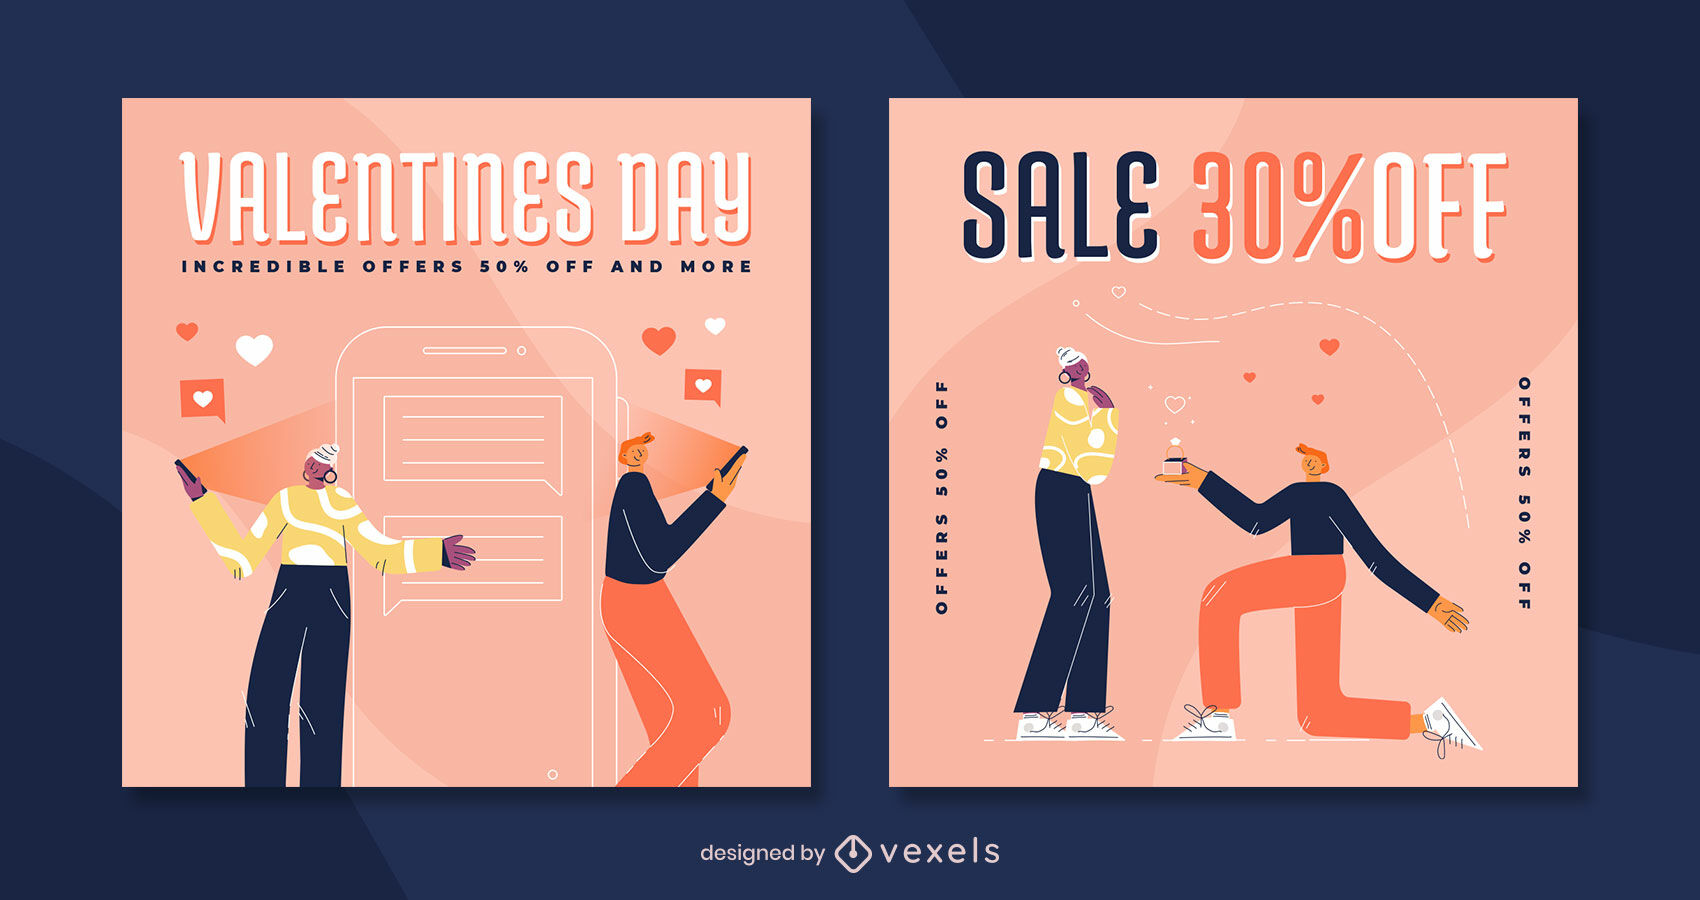 Valentines day semi flat instagram post template